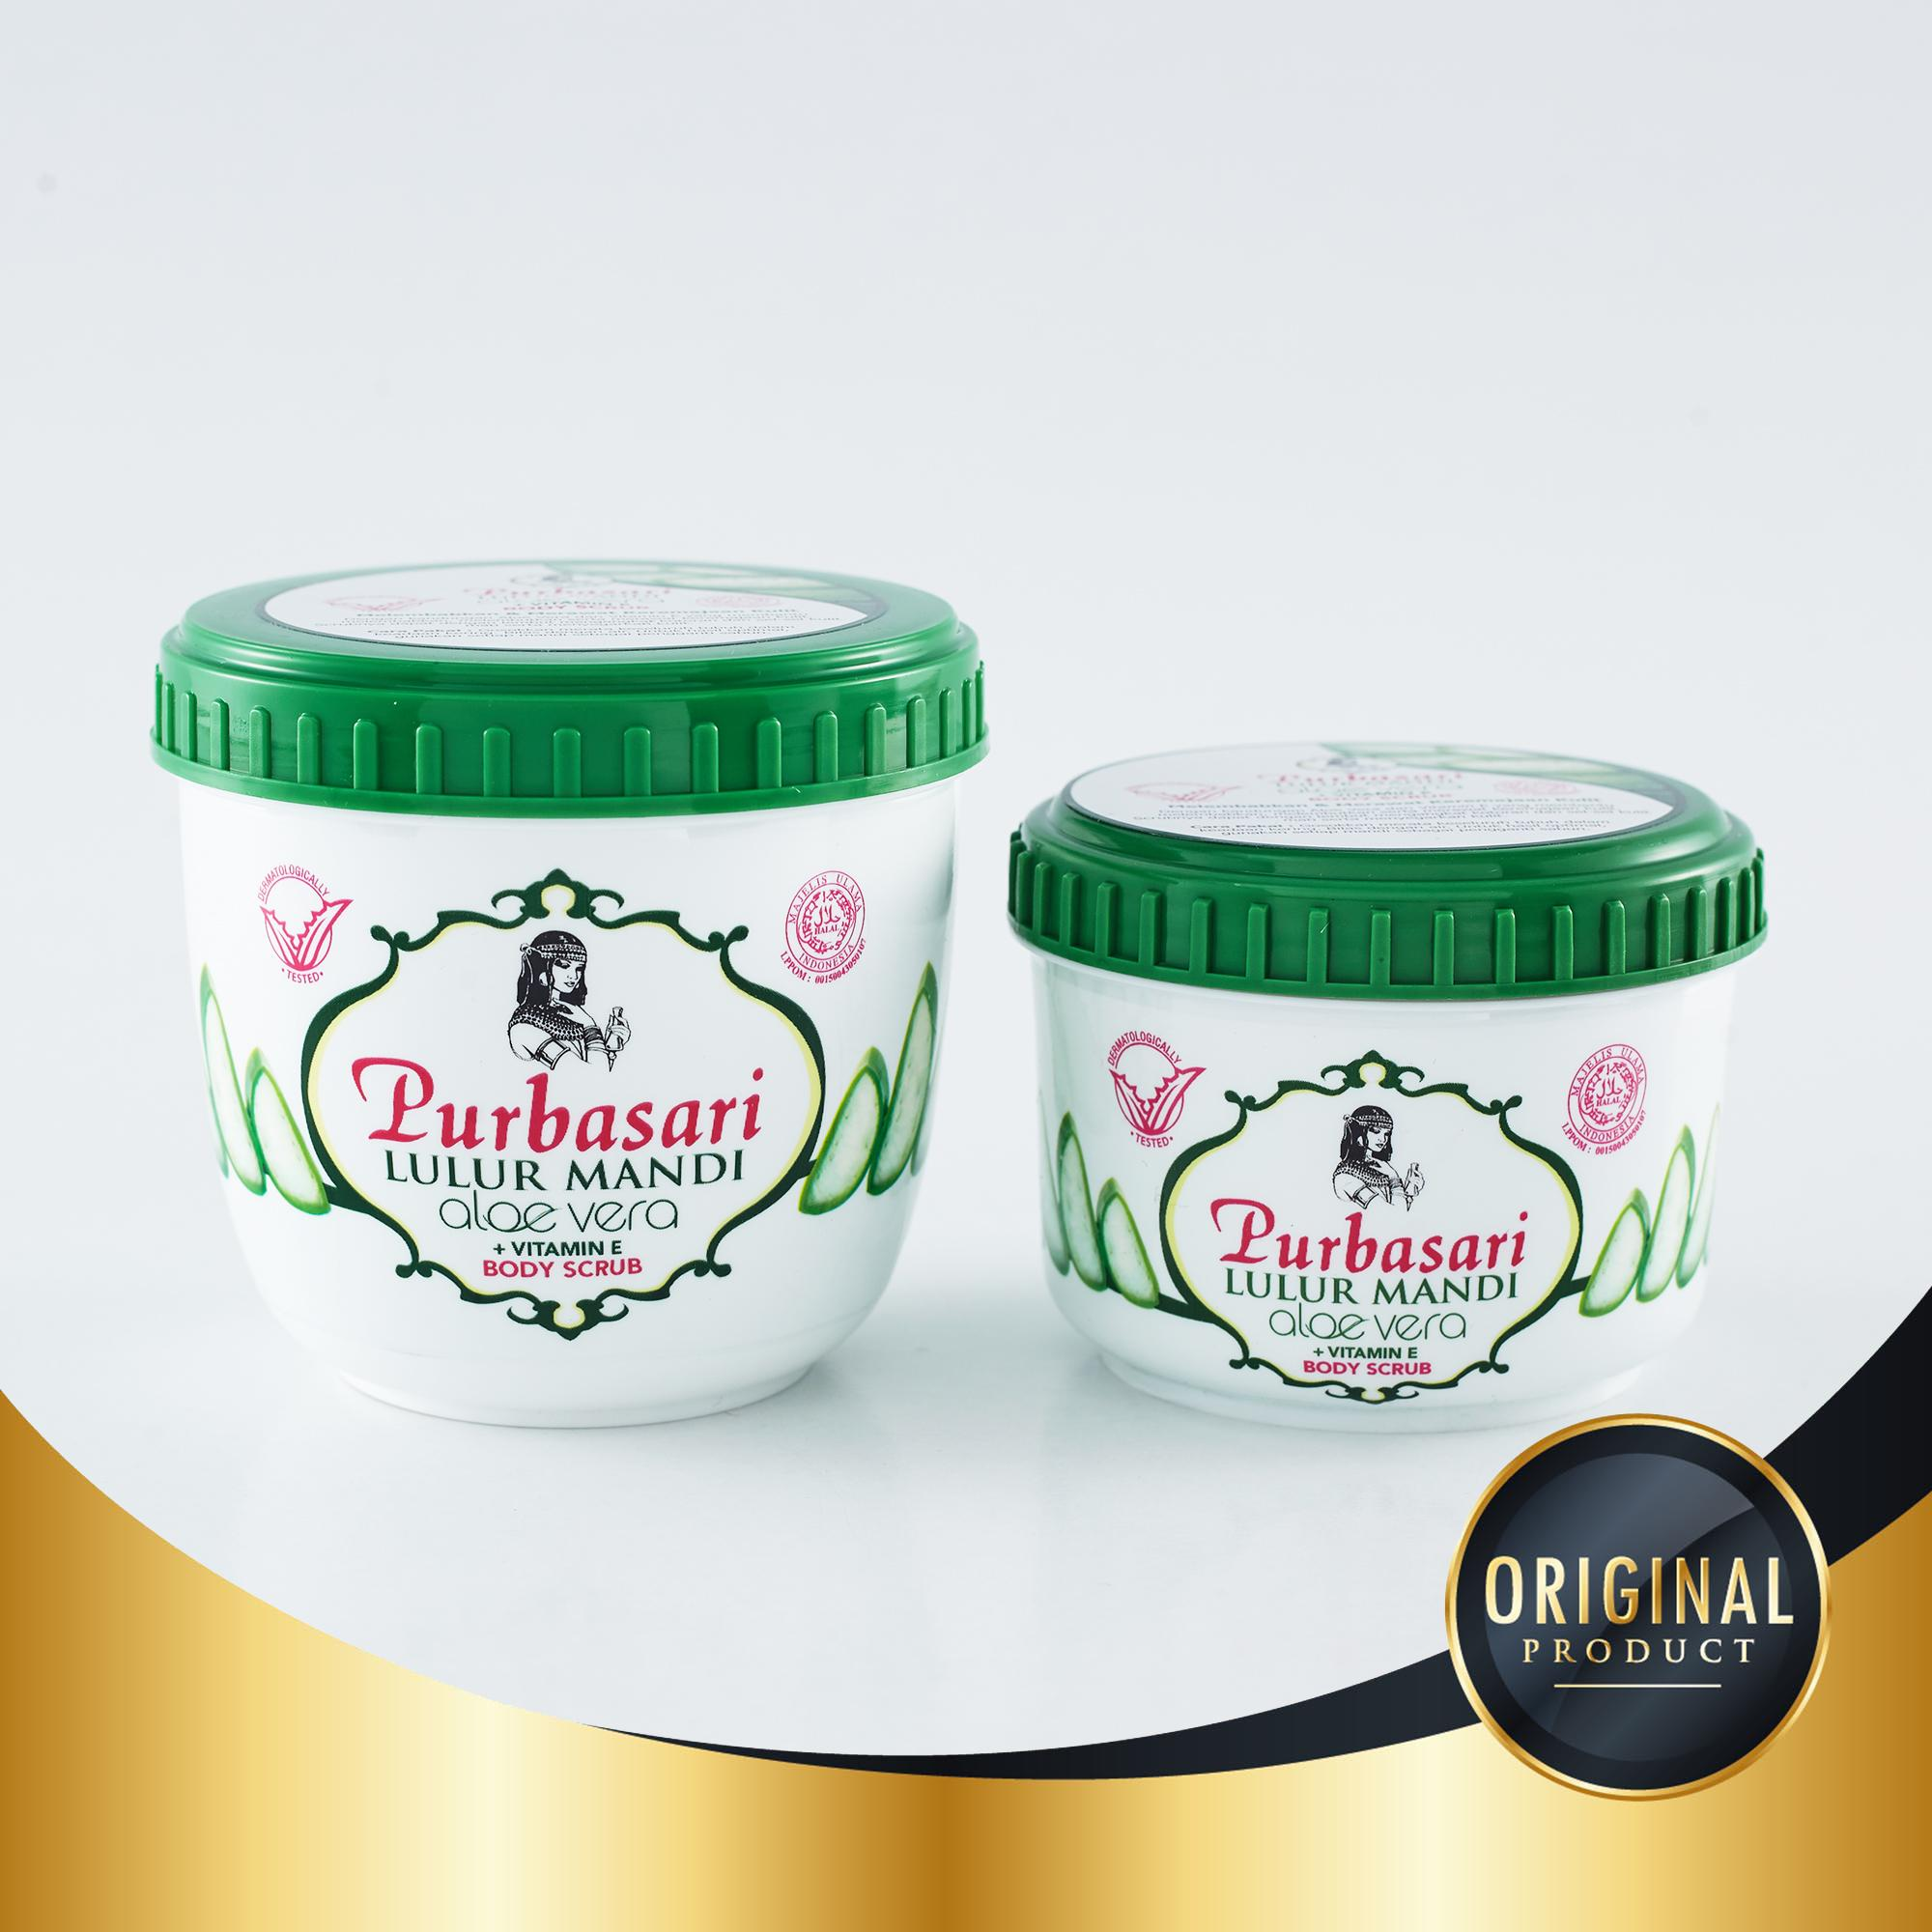 Purbasari Lulur Mandi Aloe Vera Vitamin E 235 Gr